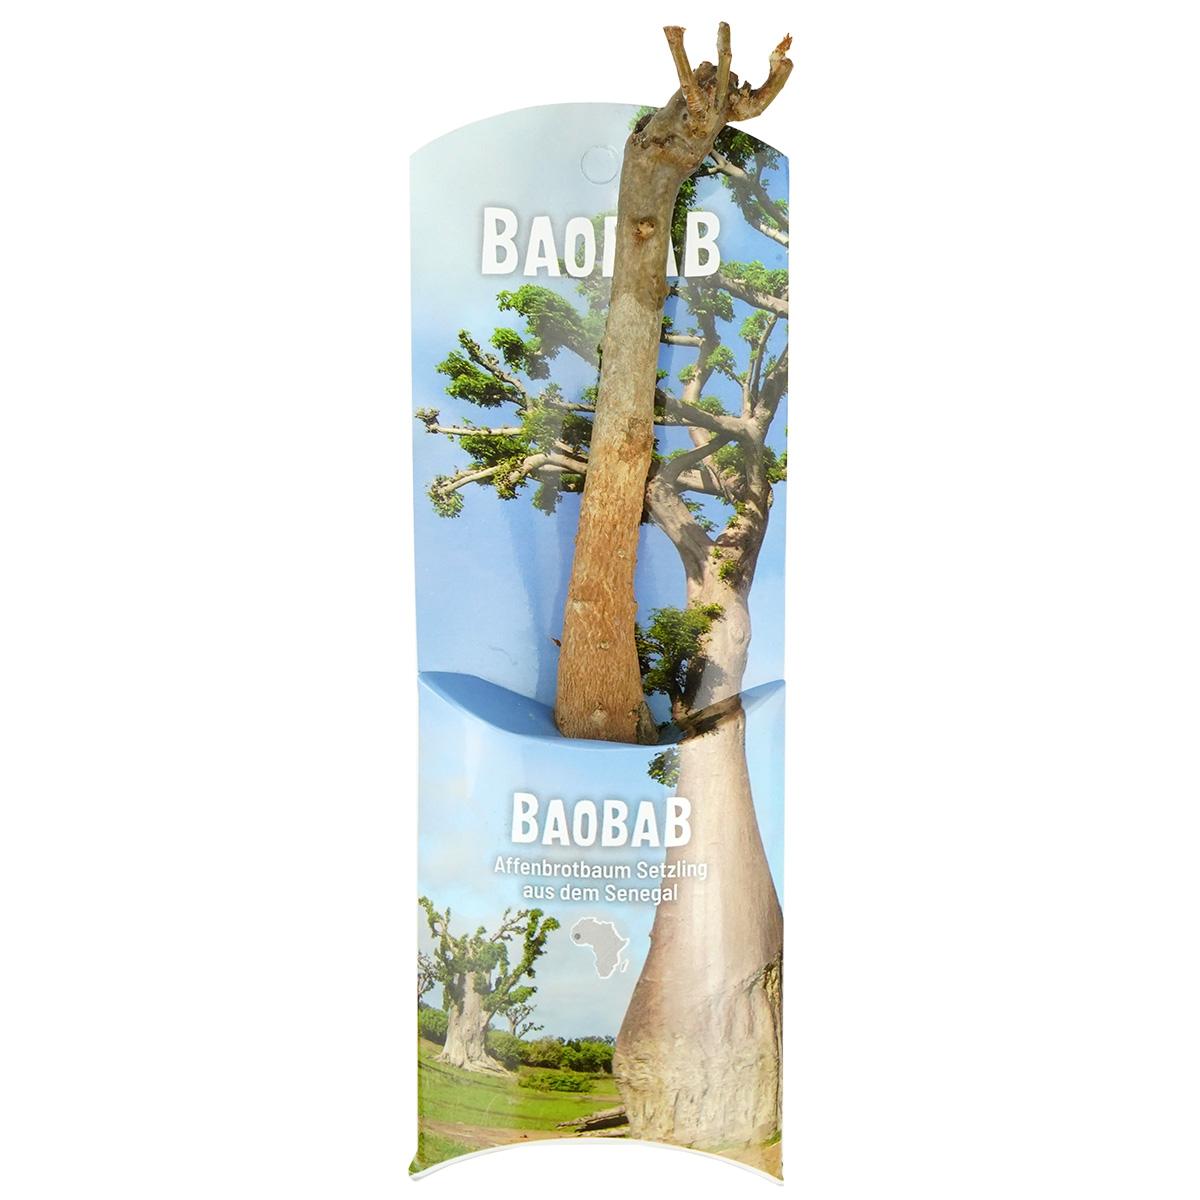 Africa's Big 5 Fairtrade Baobab/Affenbrotbaum Setzling